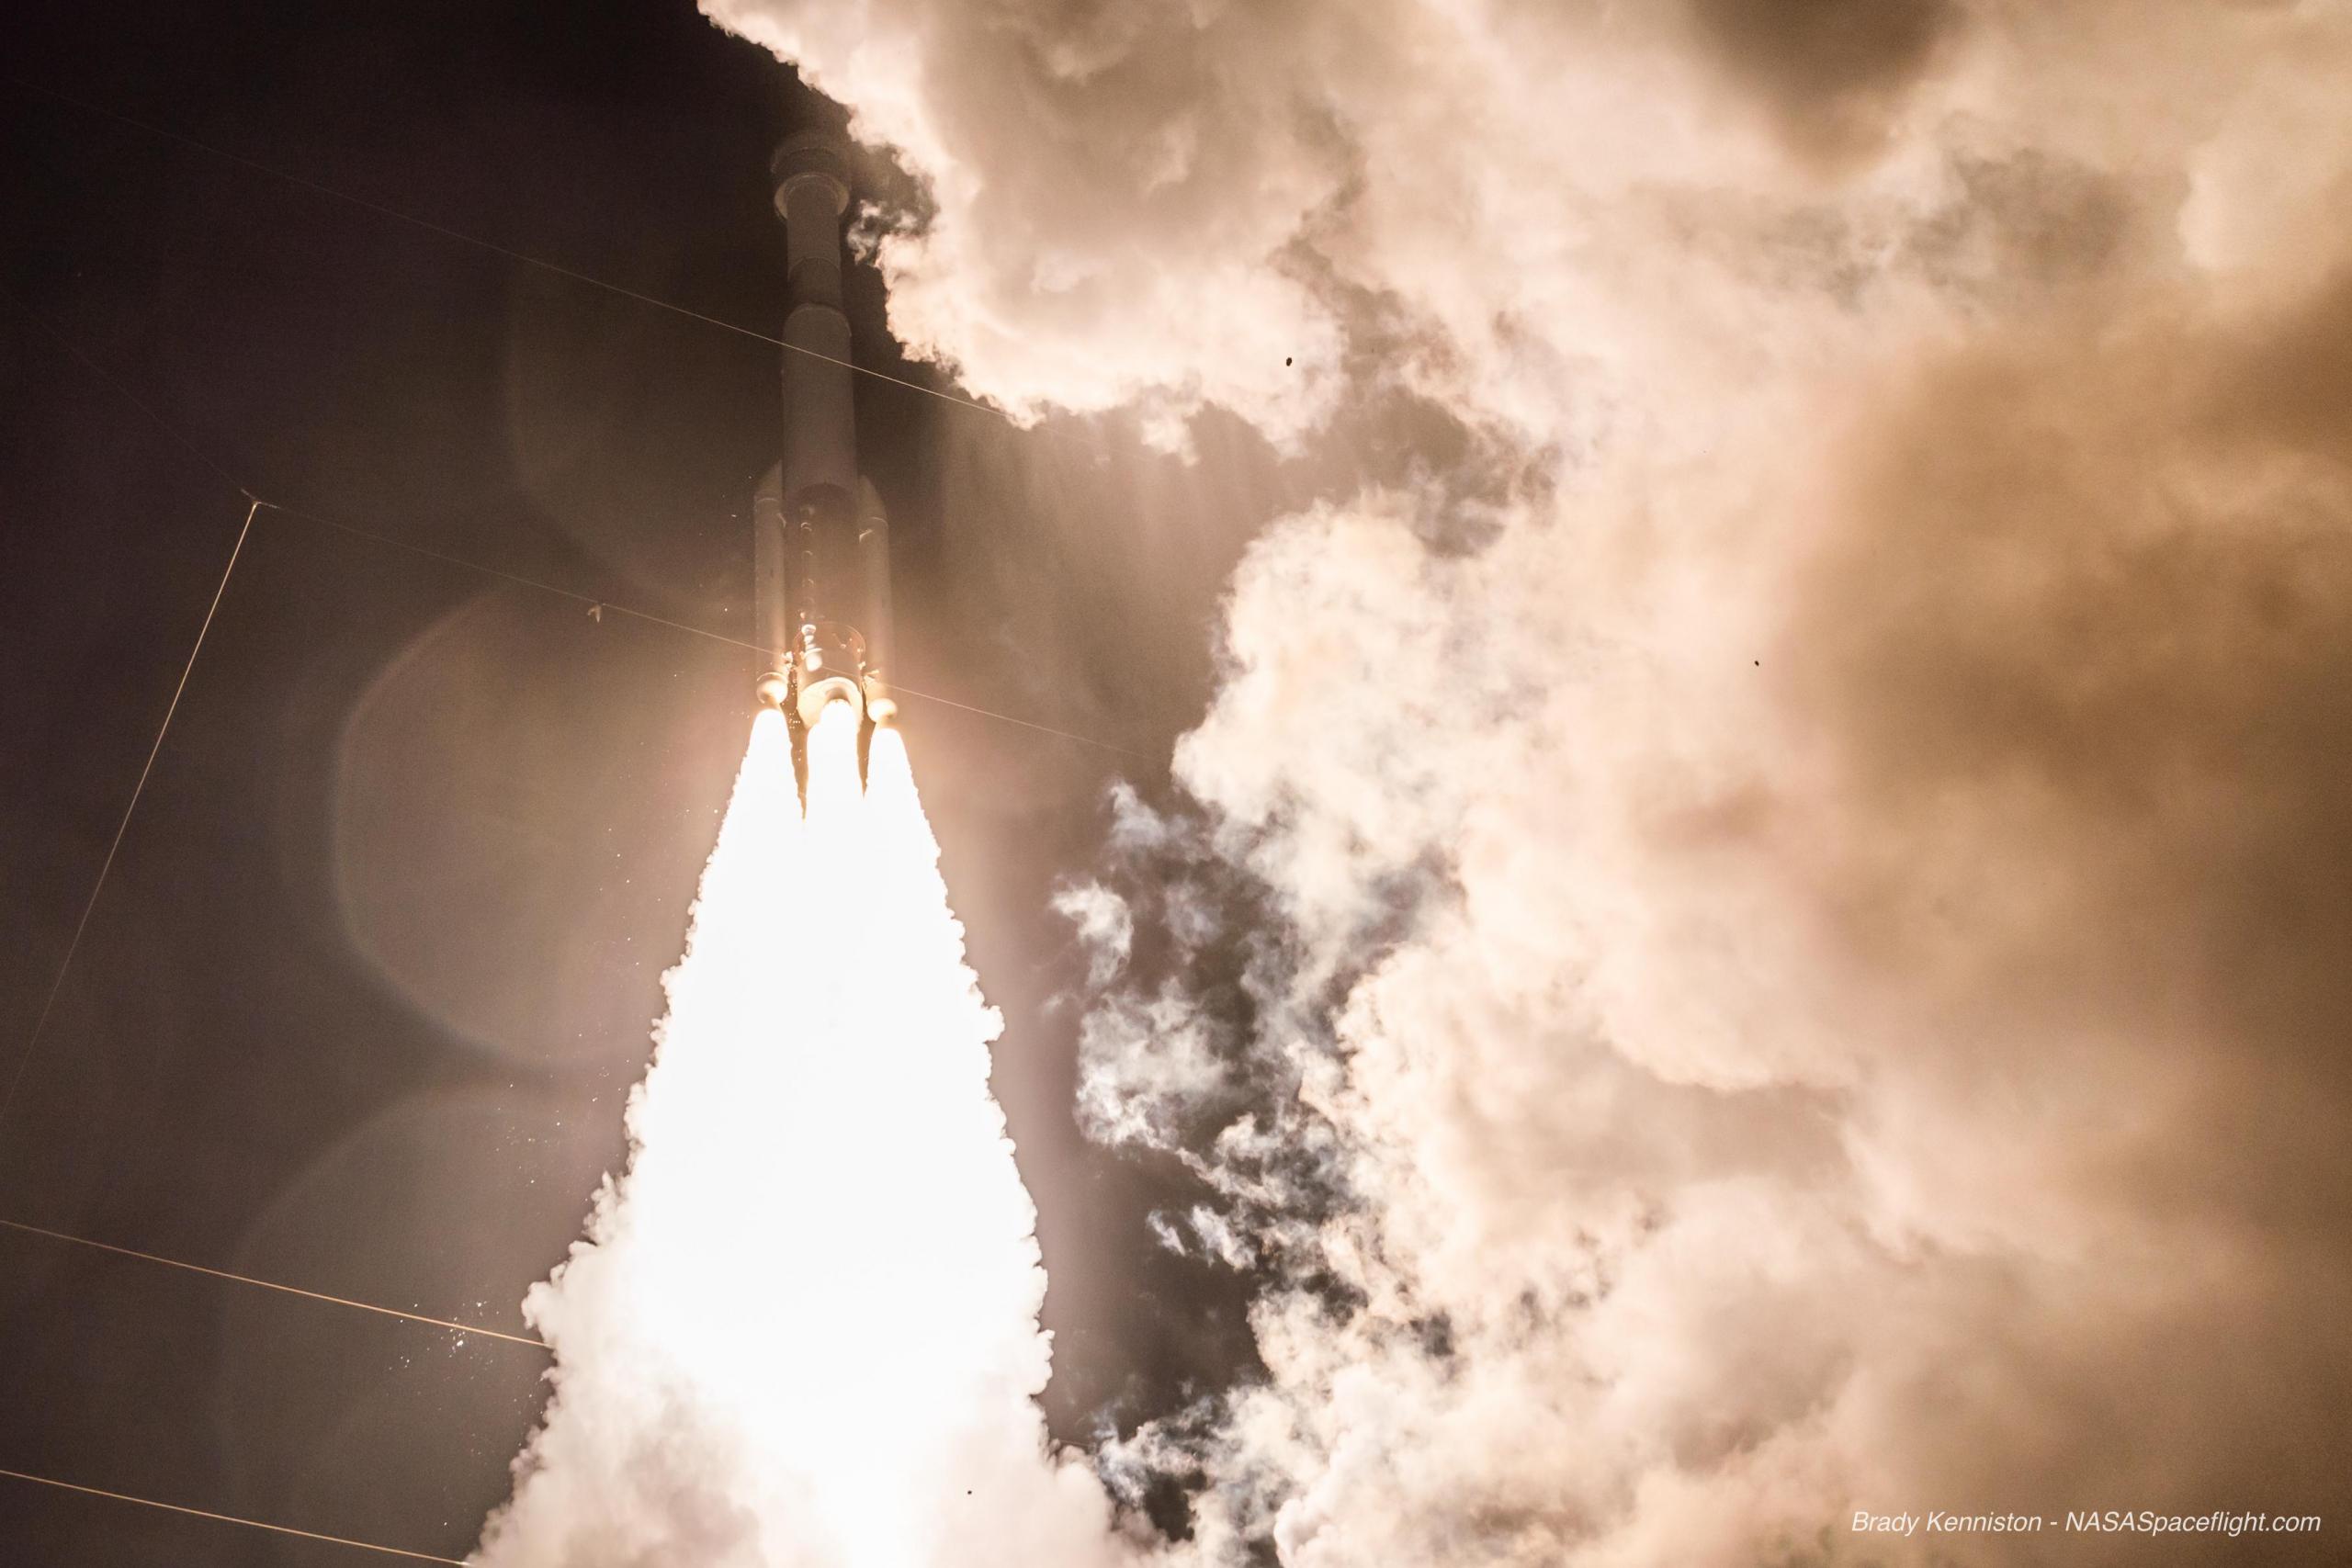 Starliner Calypso lifts off aboard its Atlas V launcher on the Orbital Flight Test – via Brady Kenniston for NSF  L2